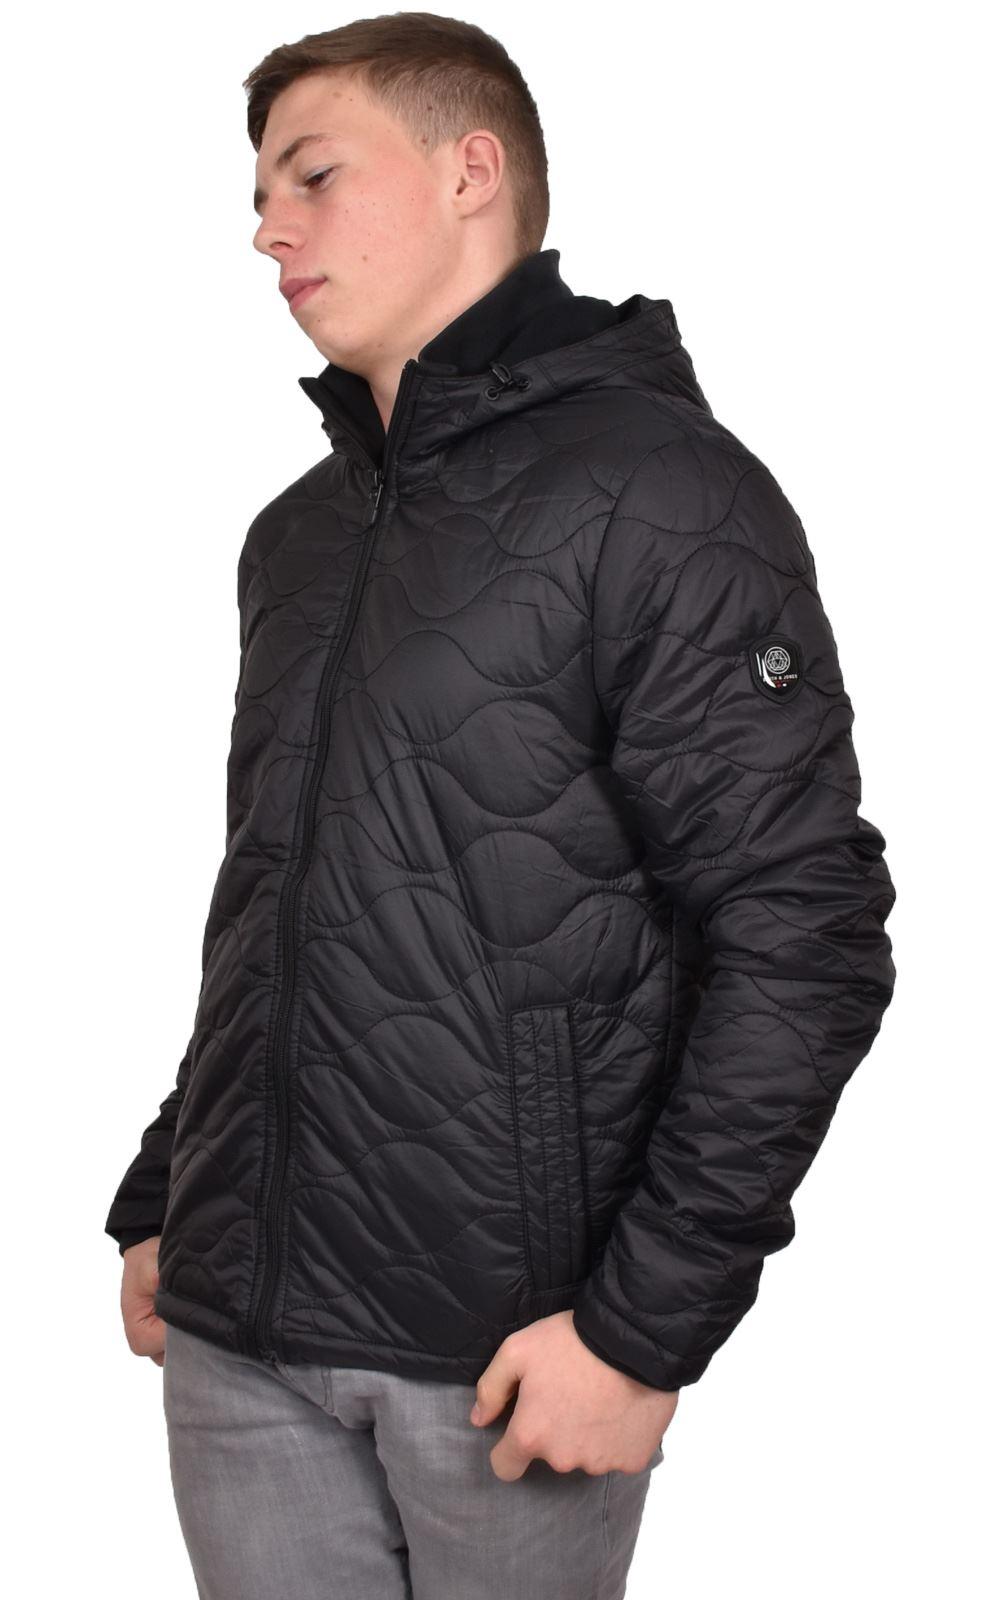 Mens-Smith-amp-Jones-Jacket-Full-Zip-Fleece-Lined-Hooded-Light-Weight-Warm-Coat thumbnail 3